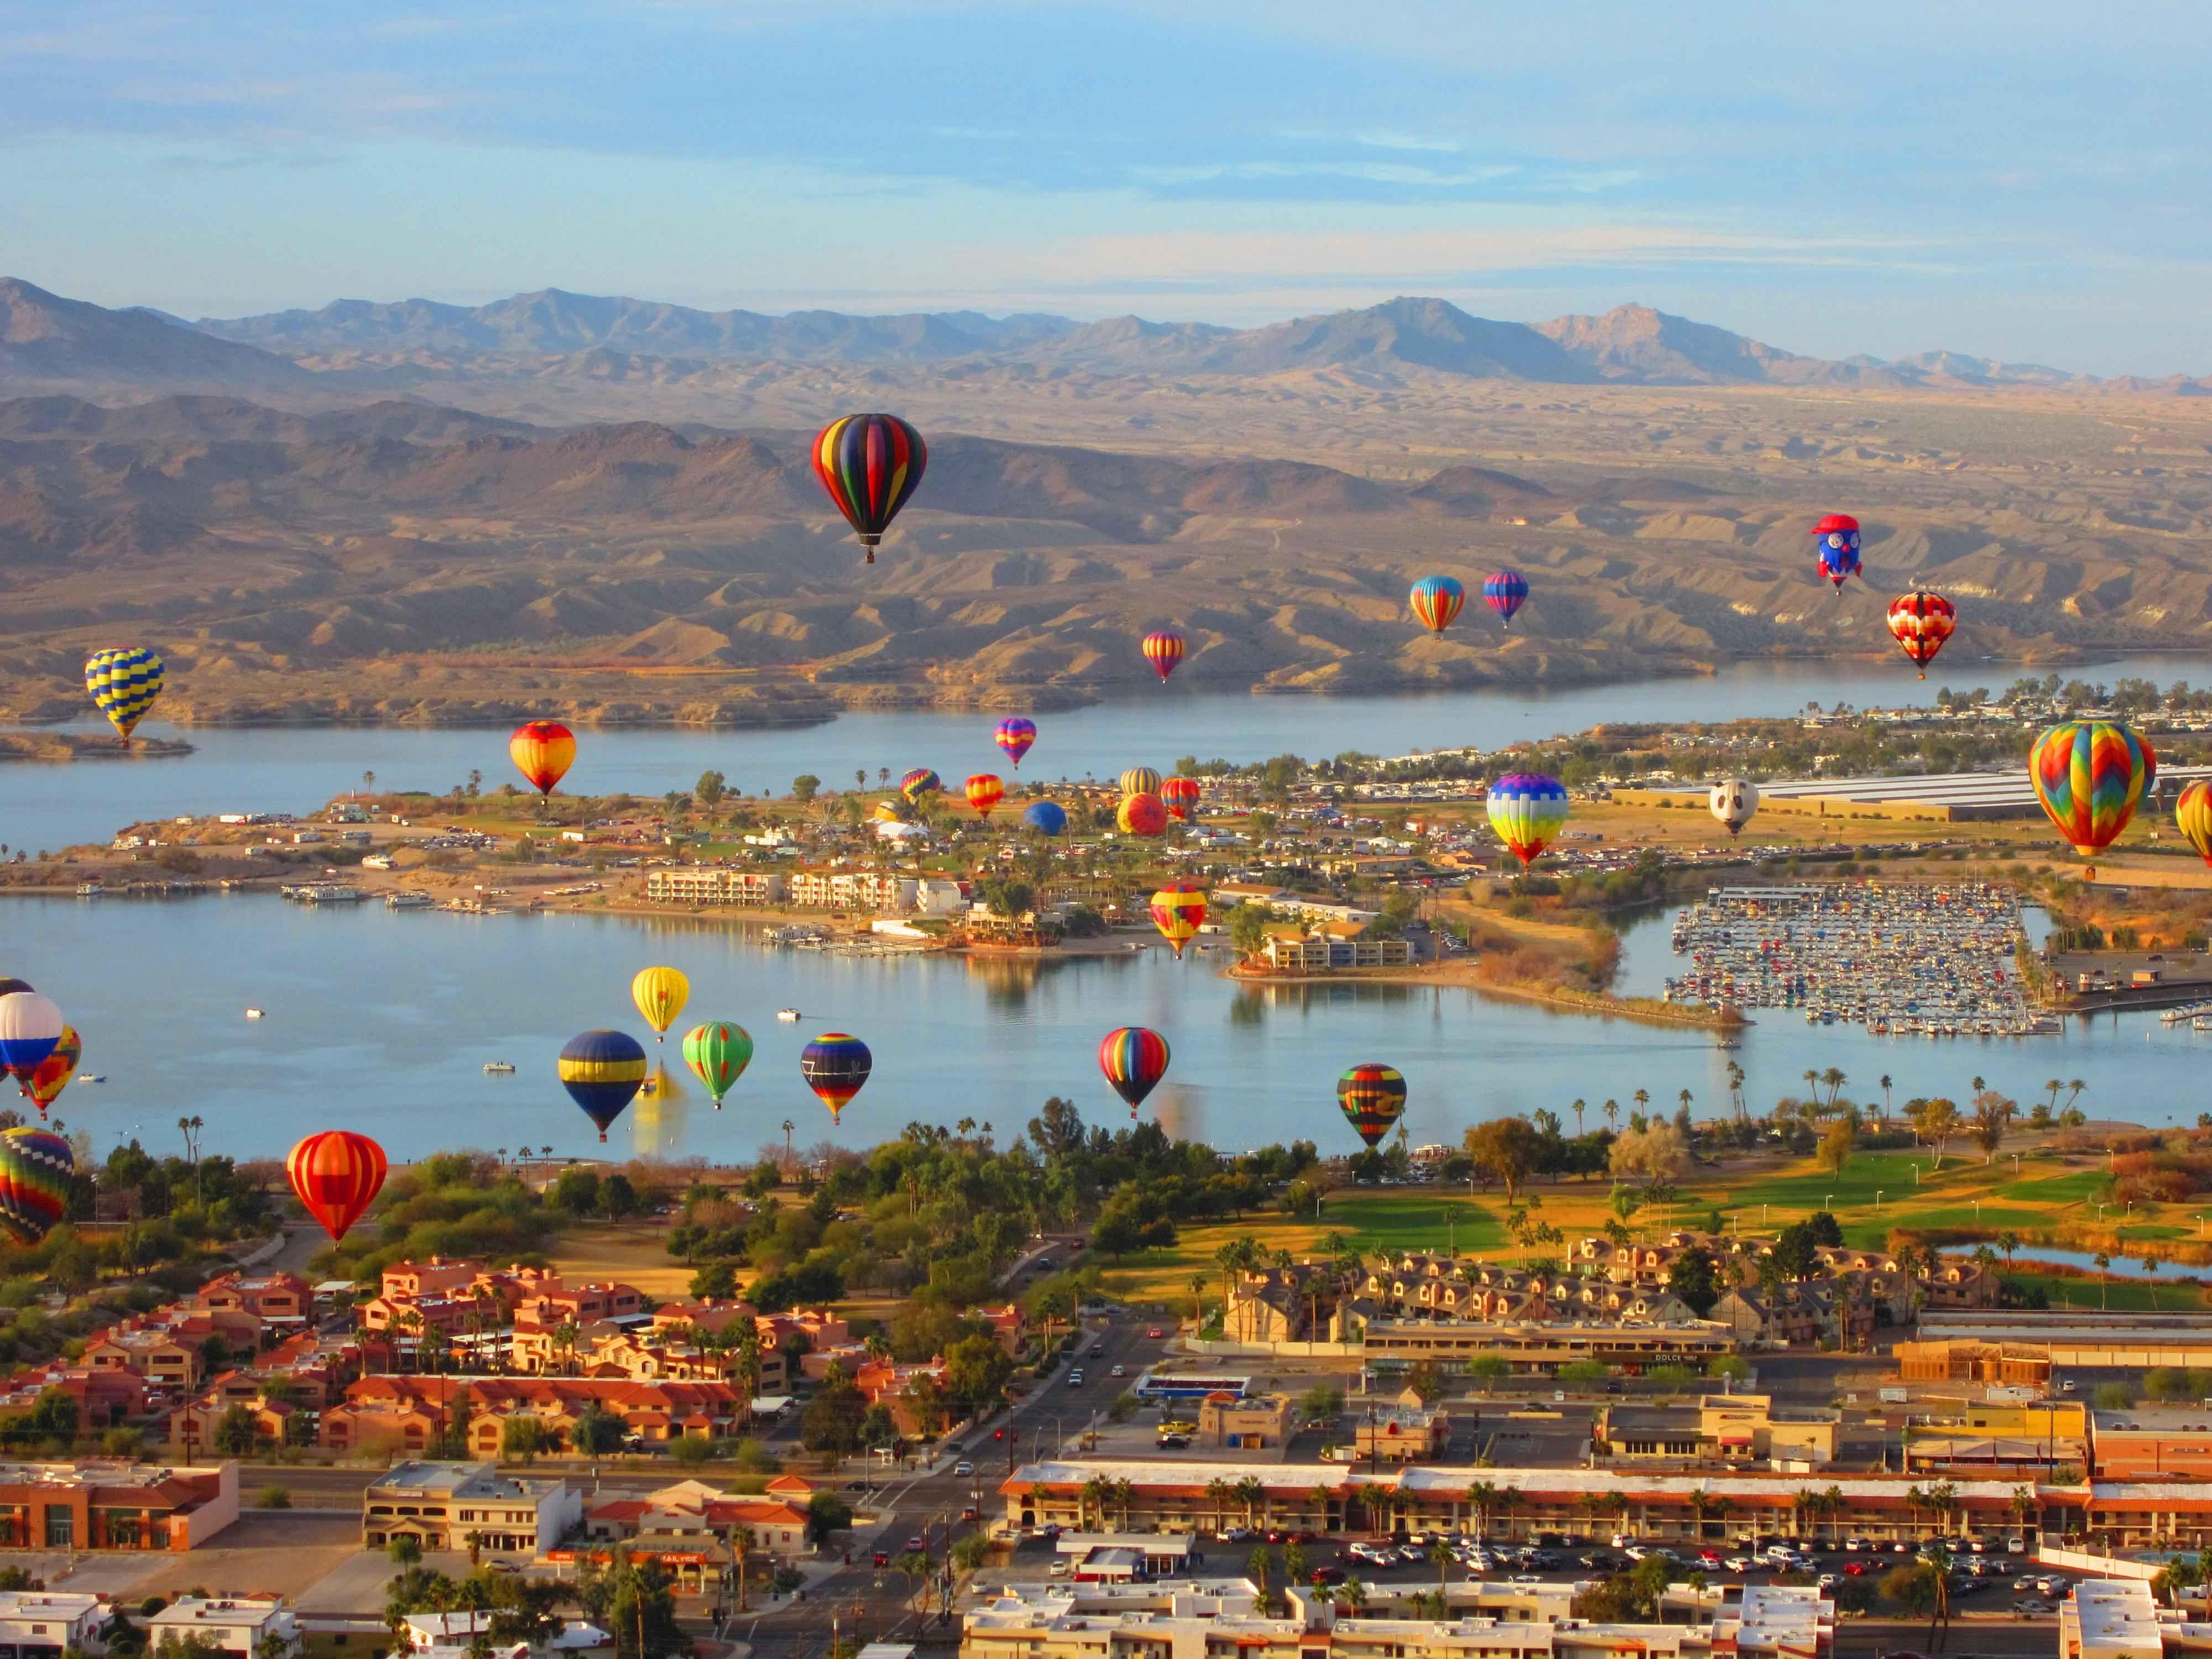 Havasu Balloon Fest & Fair Lake Havasu Events in 2019